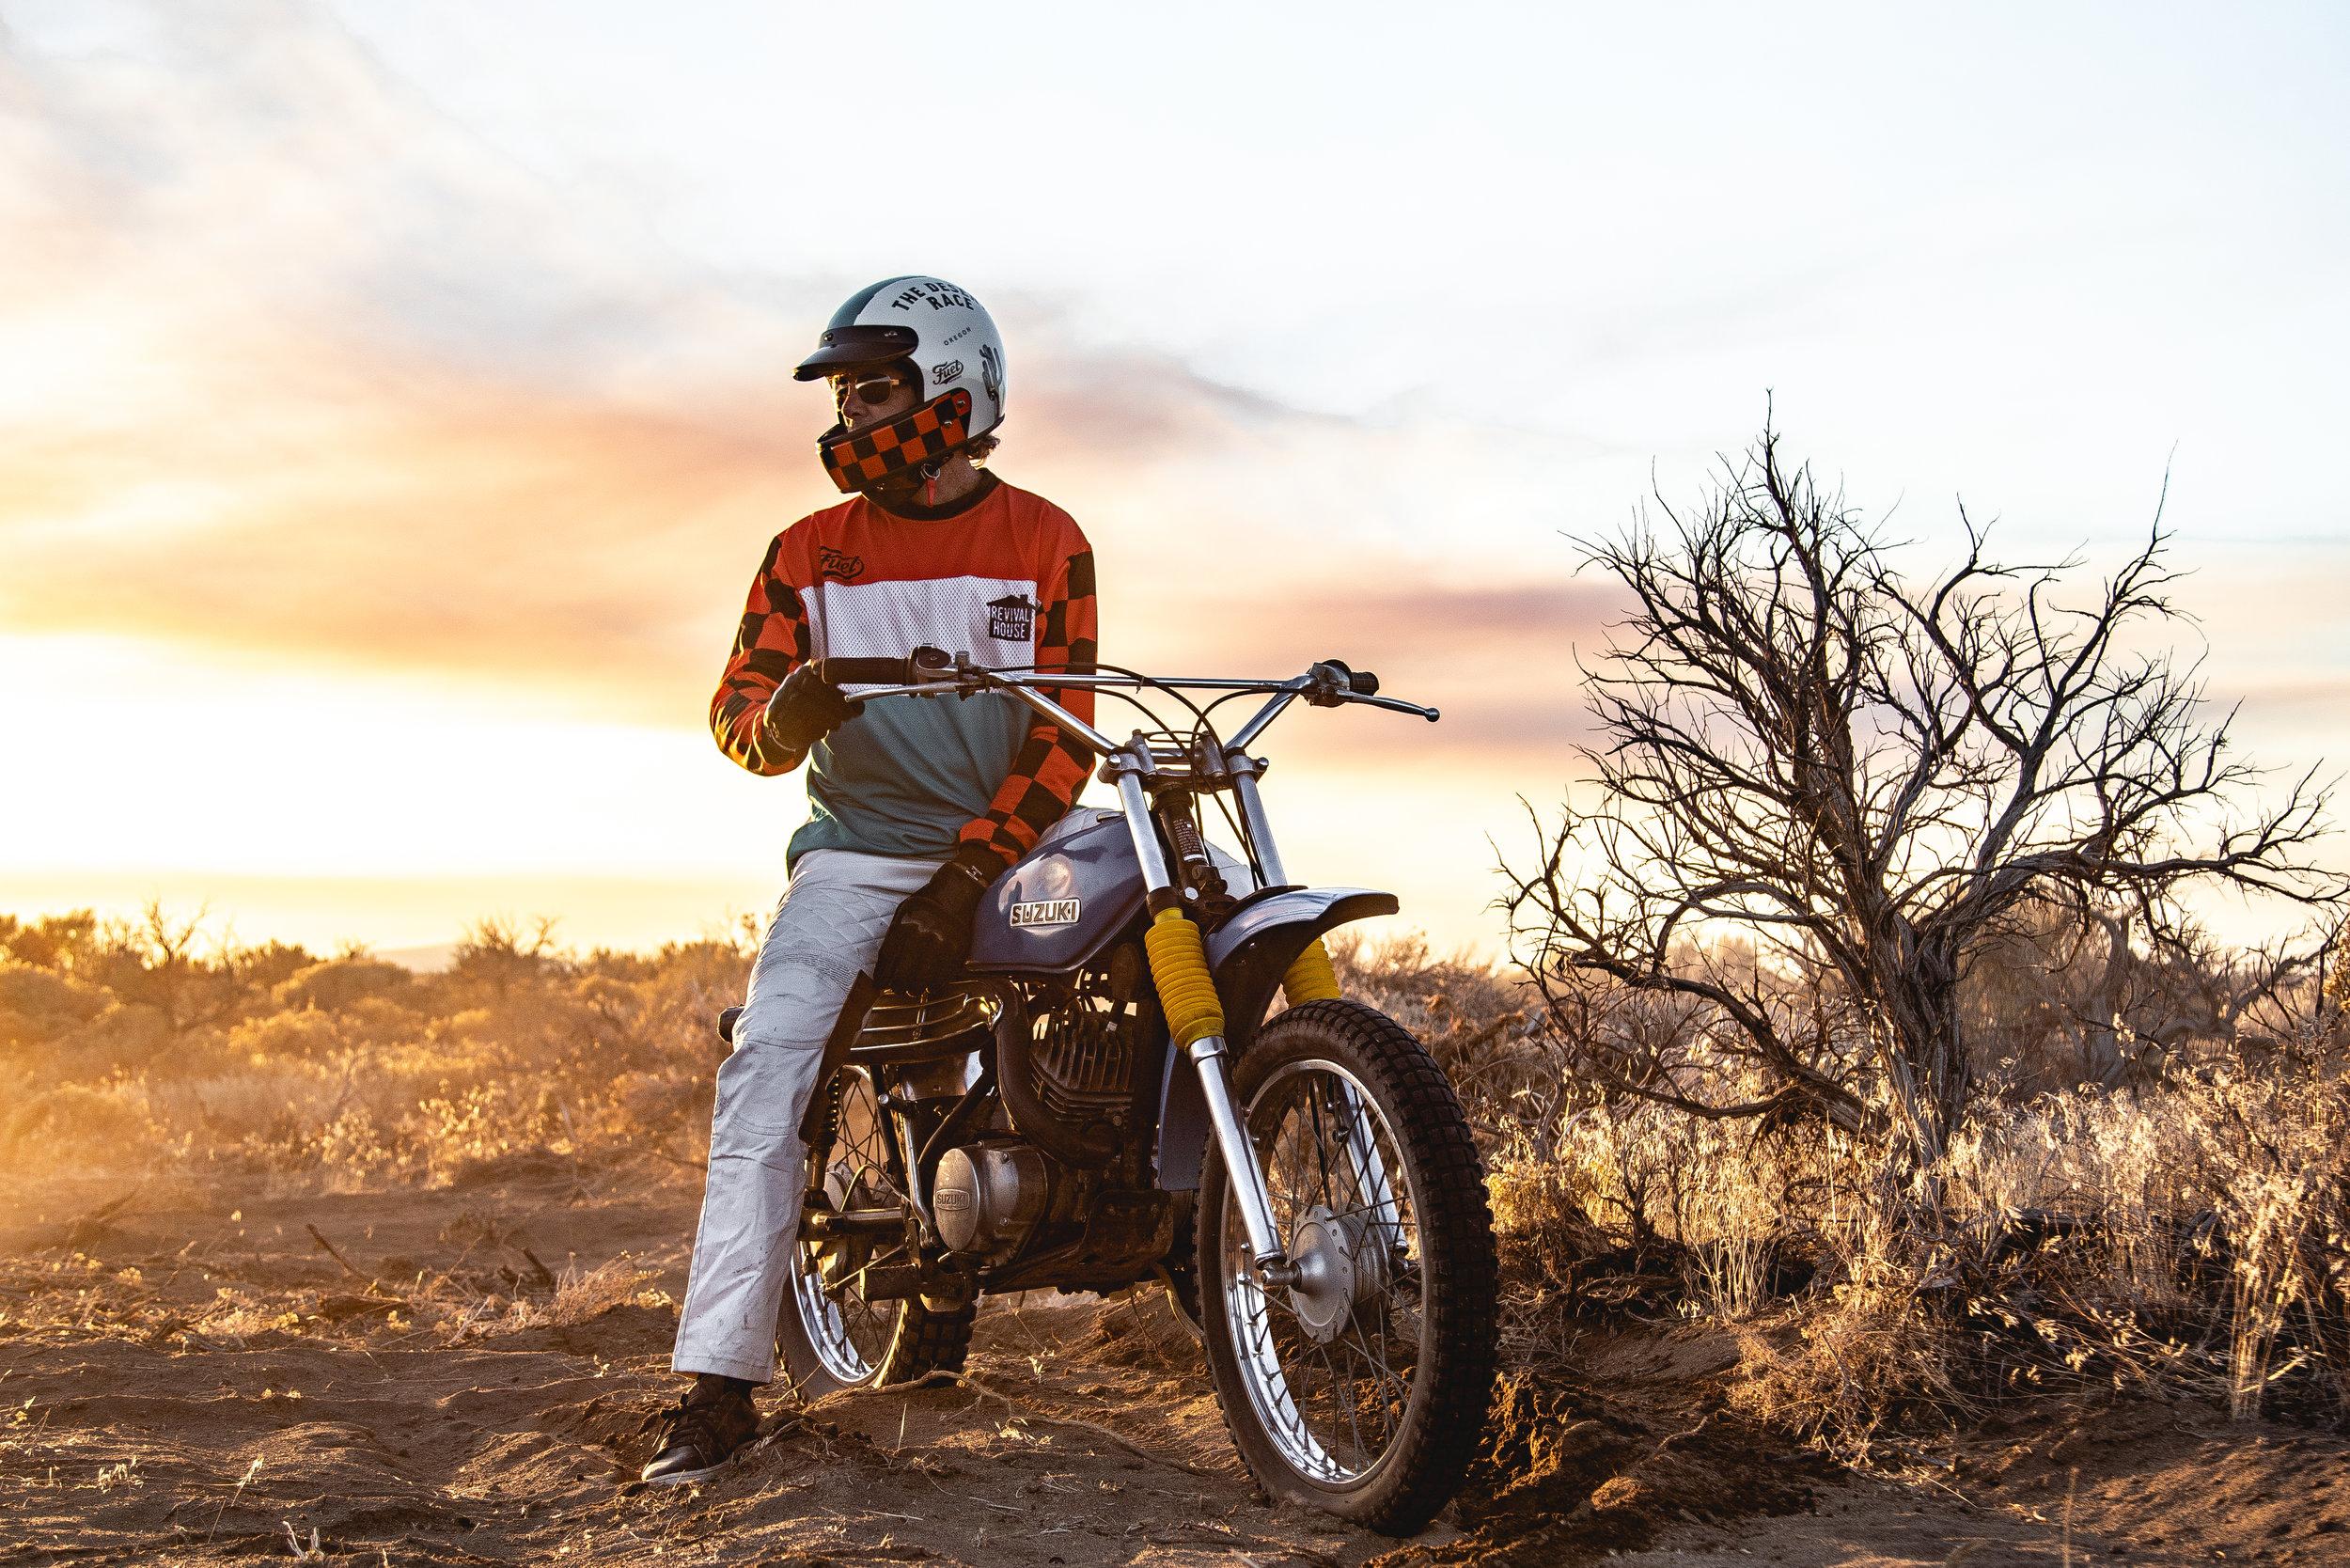 solidfoto_pedro_fuel_motorcycles_silodrome_the_desert_race_oregon 5.jpg